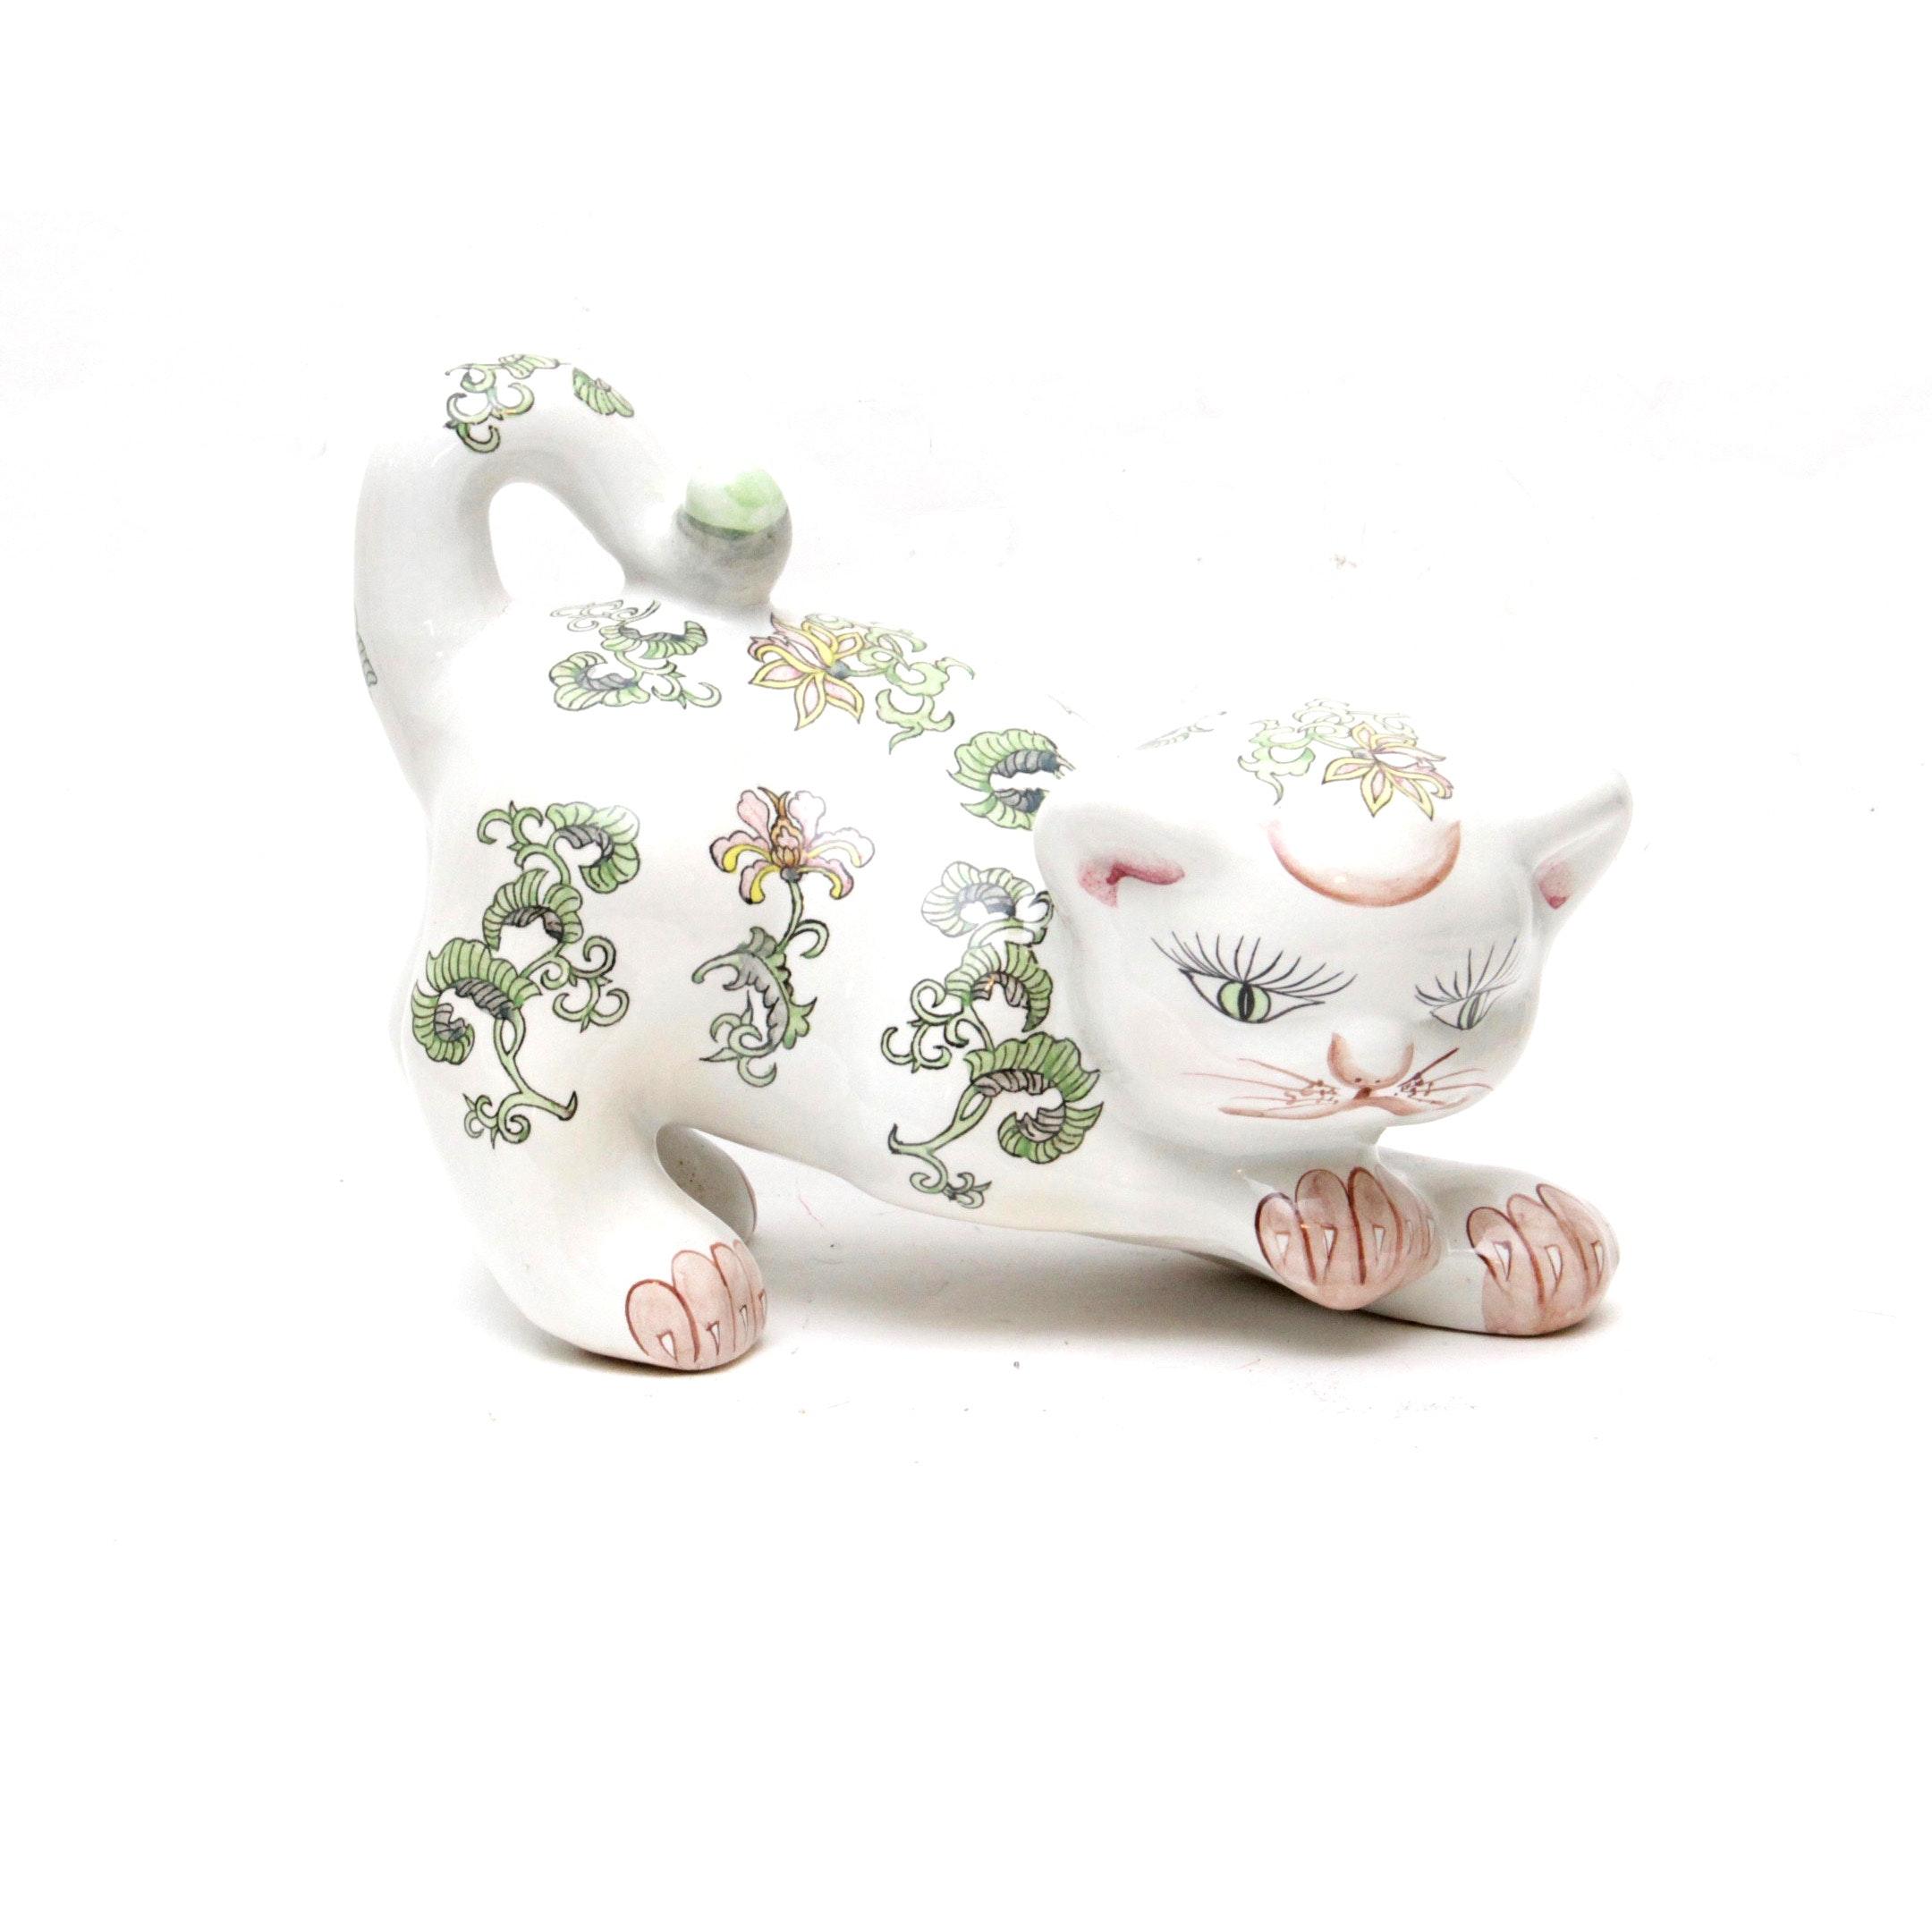 Vintage Ceramic Japanese Cat with Floral Motif